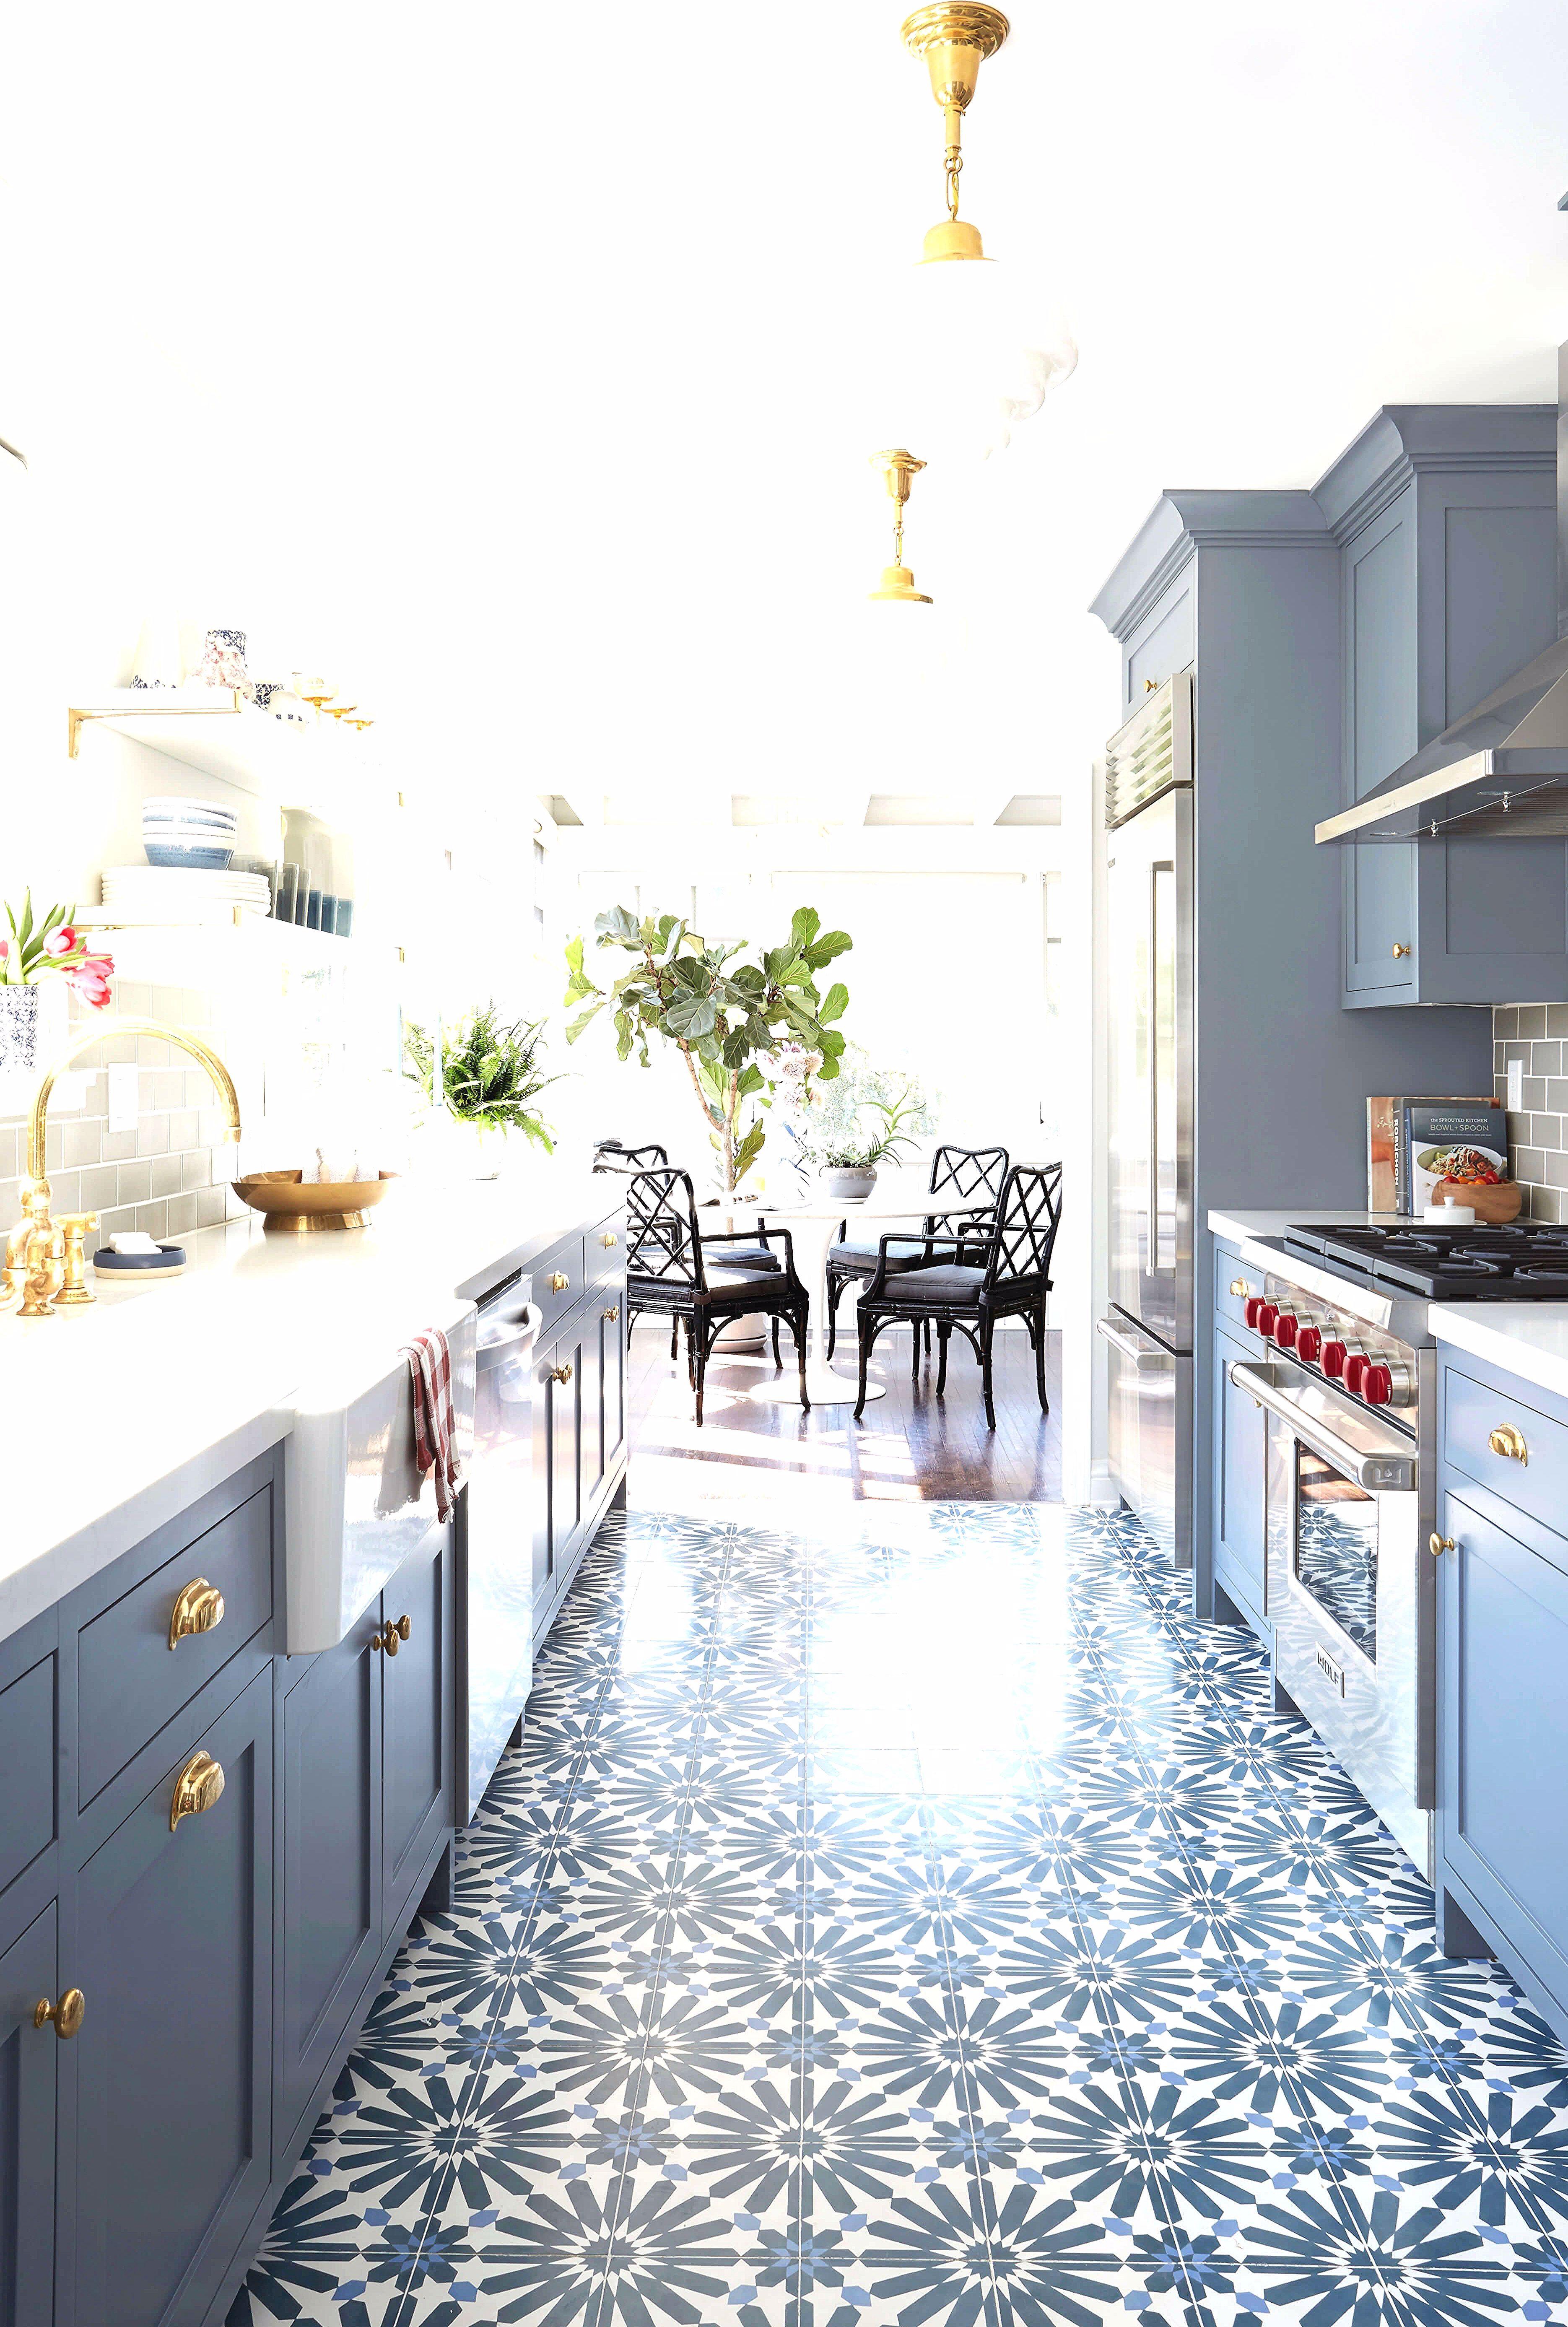 pin by terrance funk on tapis de cuisine in 2020 white kitchen decor modern kitchen paint on kitchen decor blue id=80276